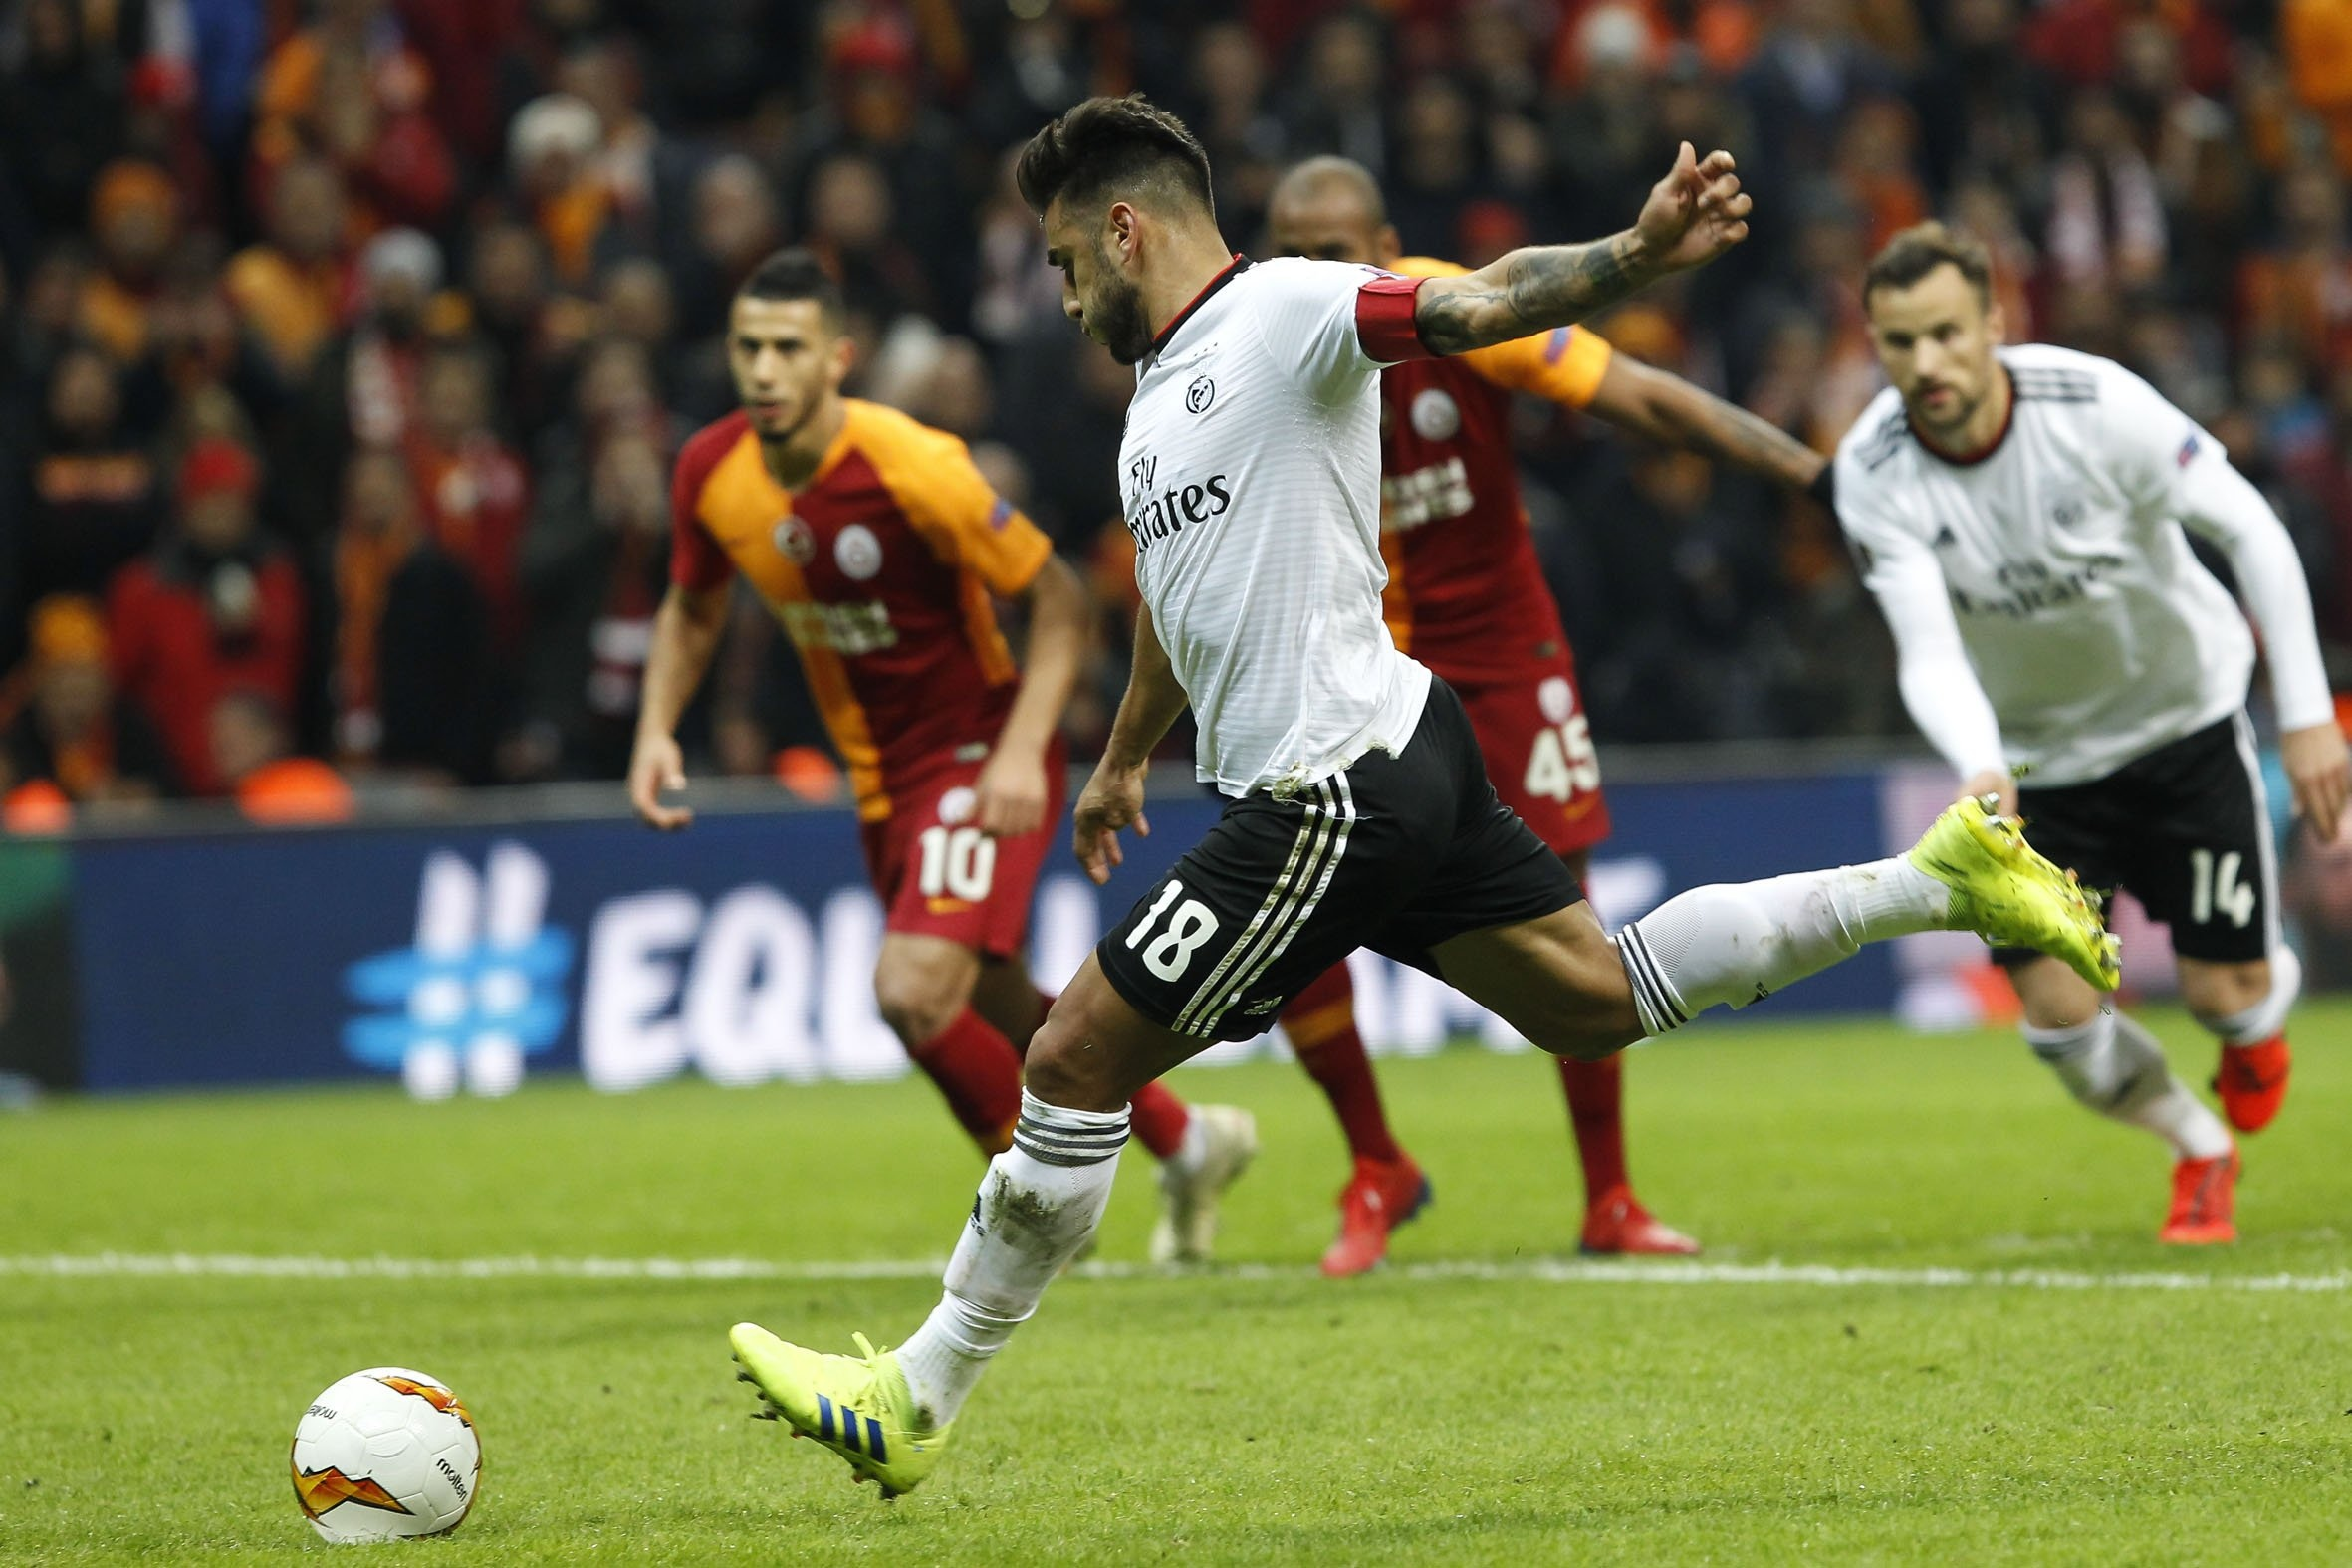 467. Galatasaray - SL Benfica 1:2